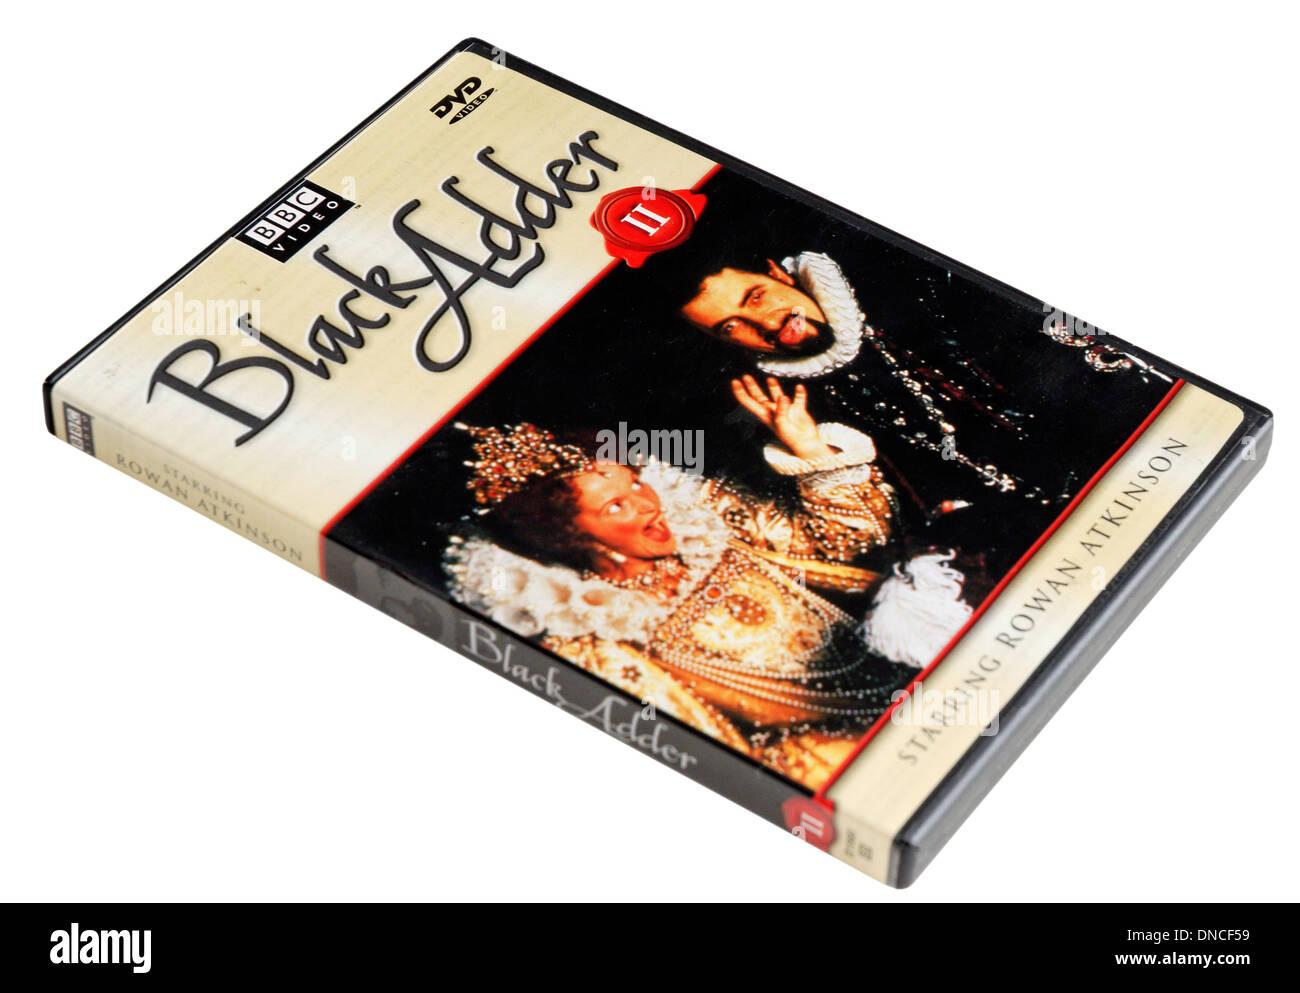 Blackadder II BBC TV Comedy classics DVD - Stock Image